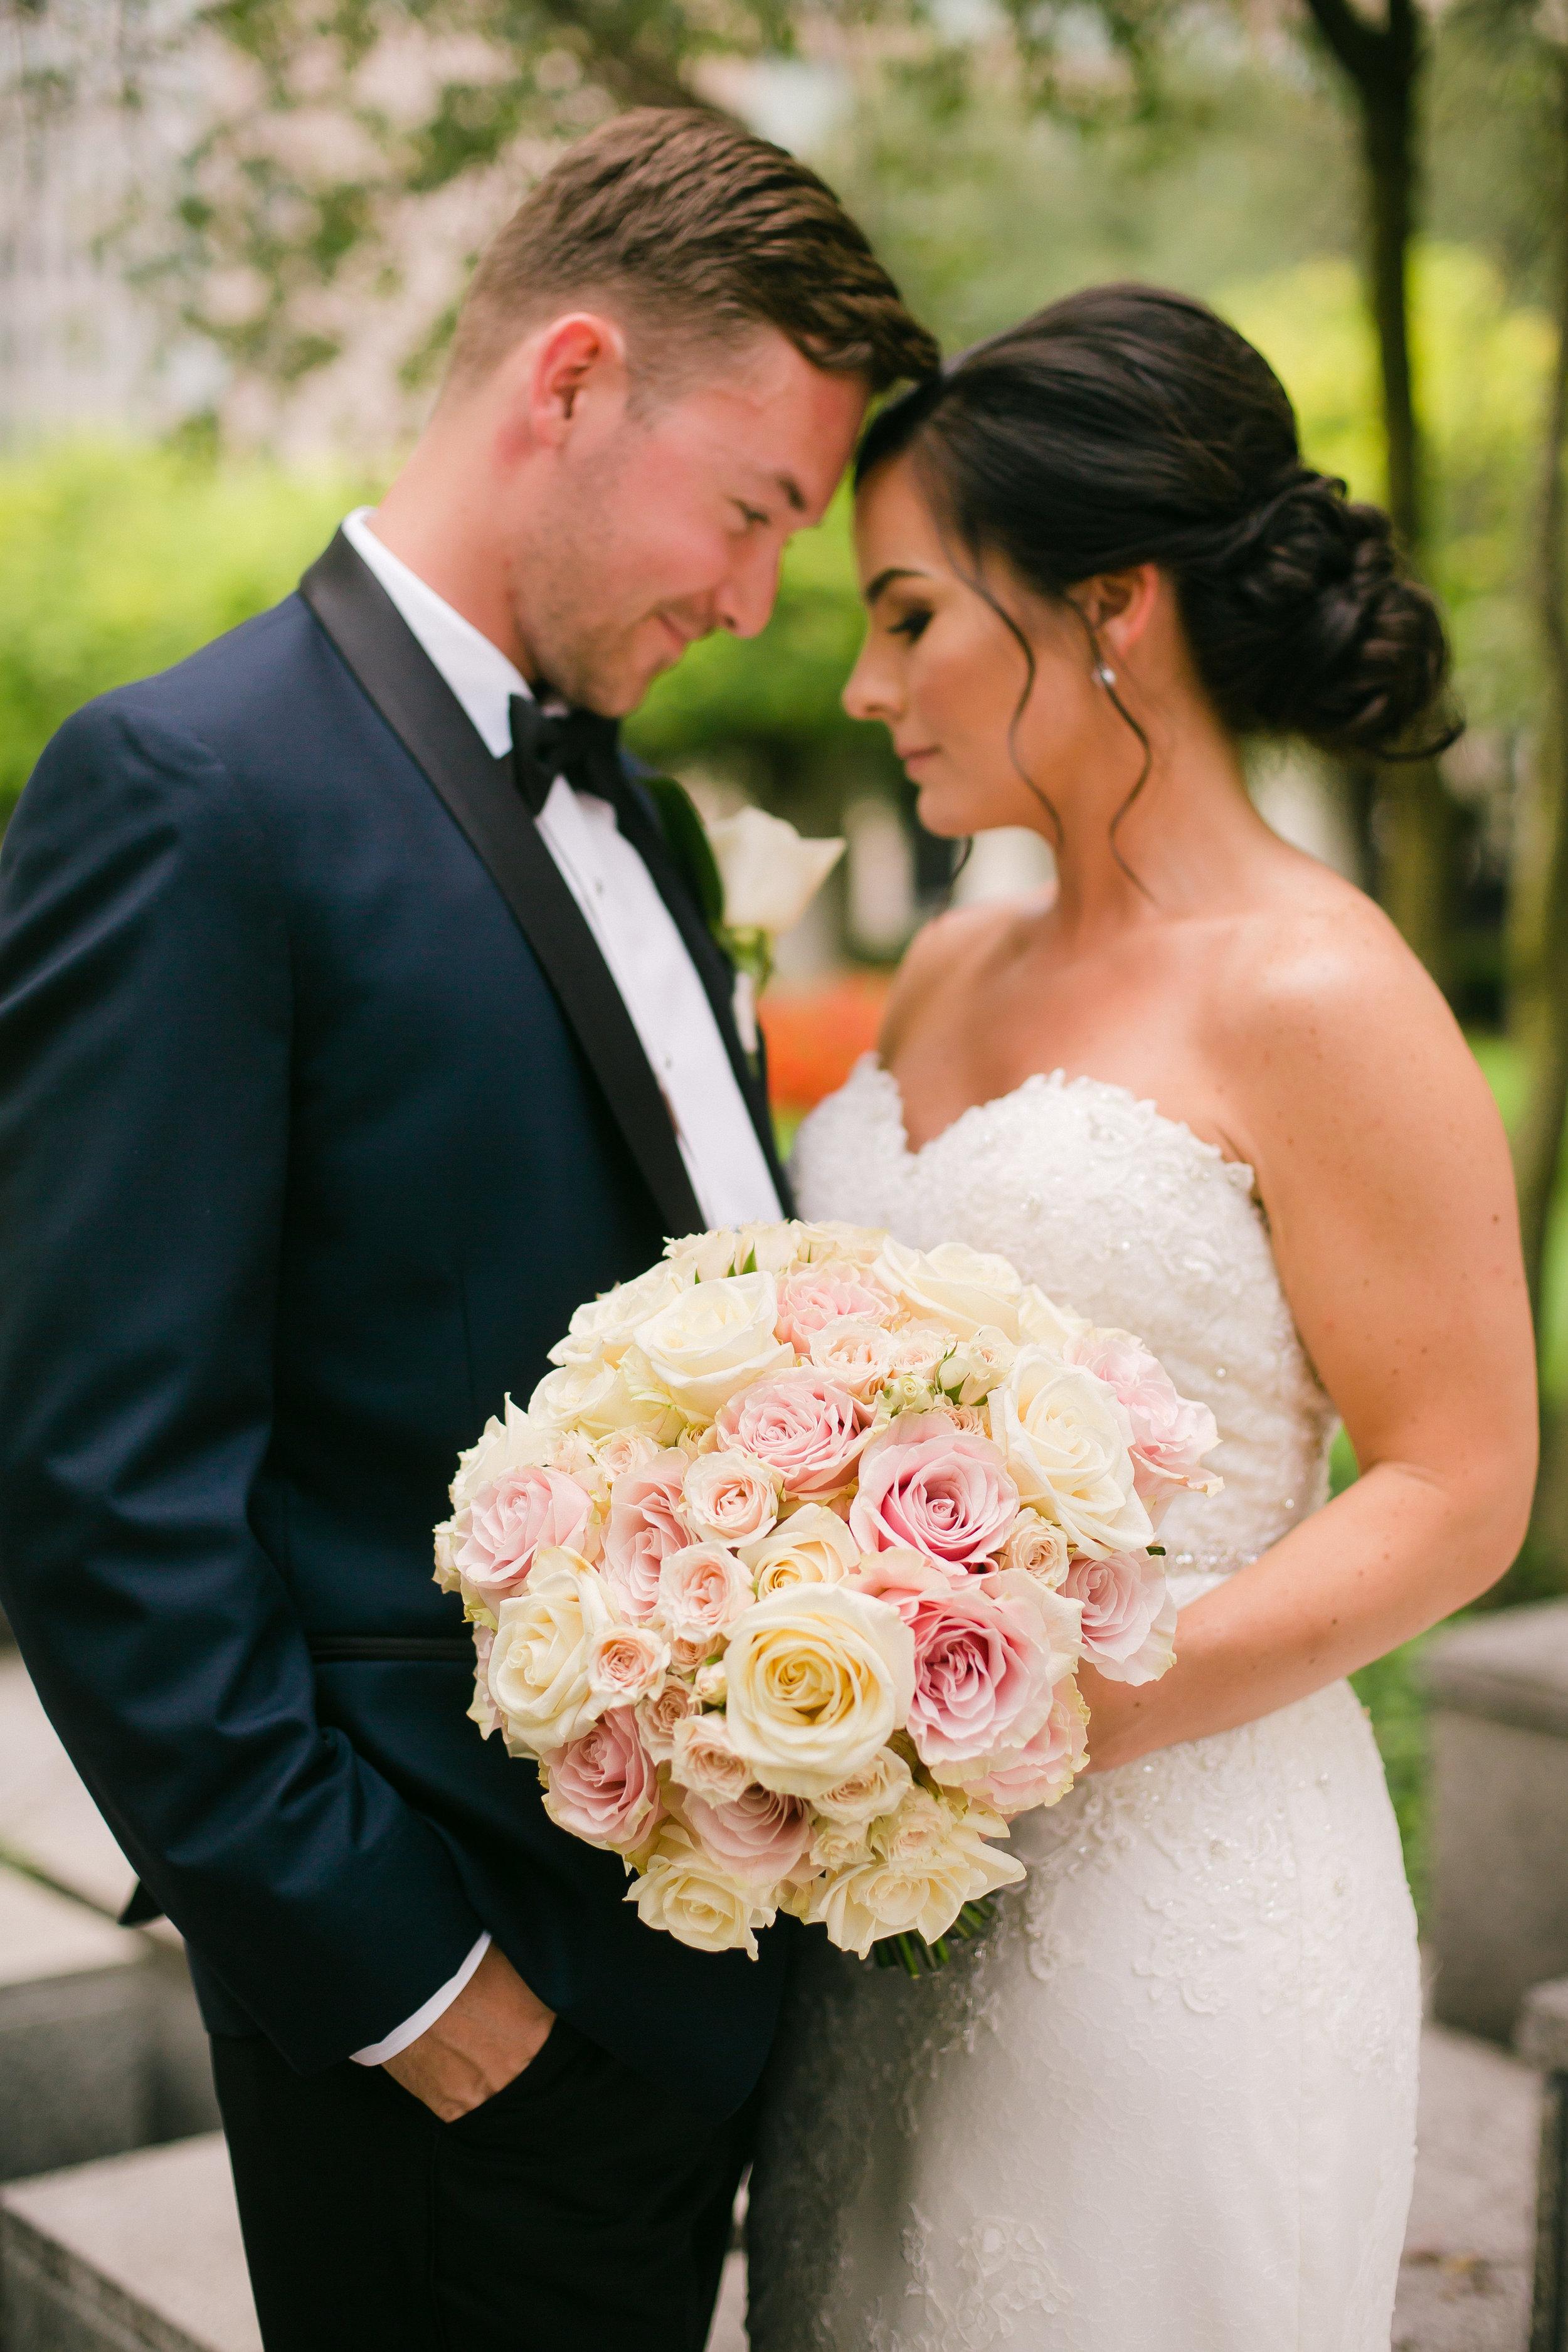 Cincinnati wedding day with stationery by Poeme